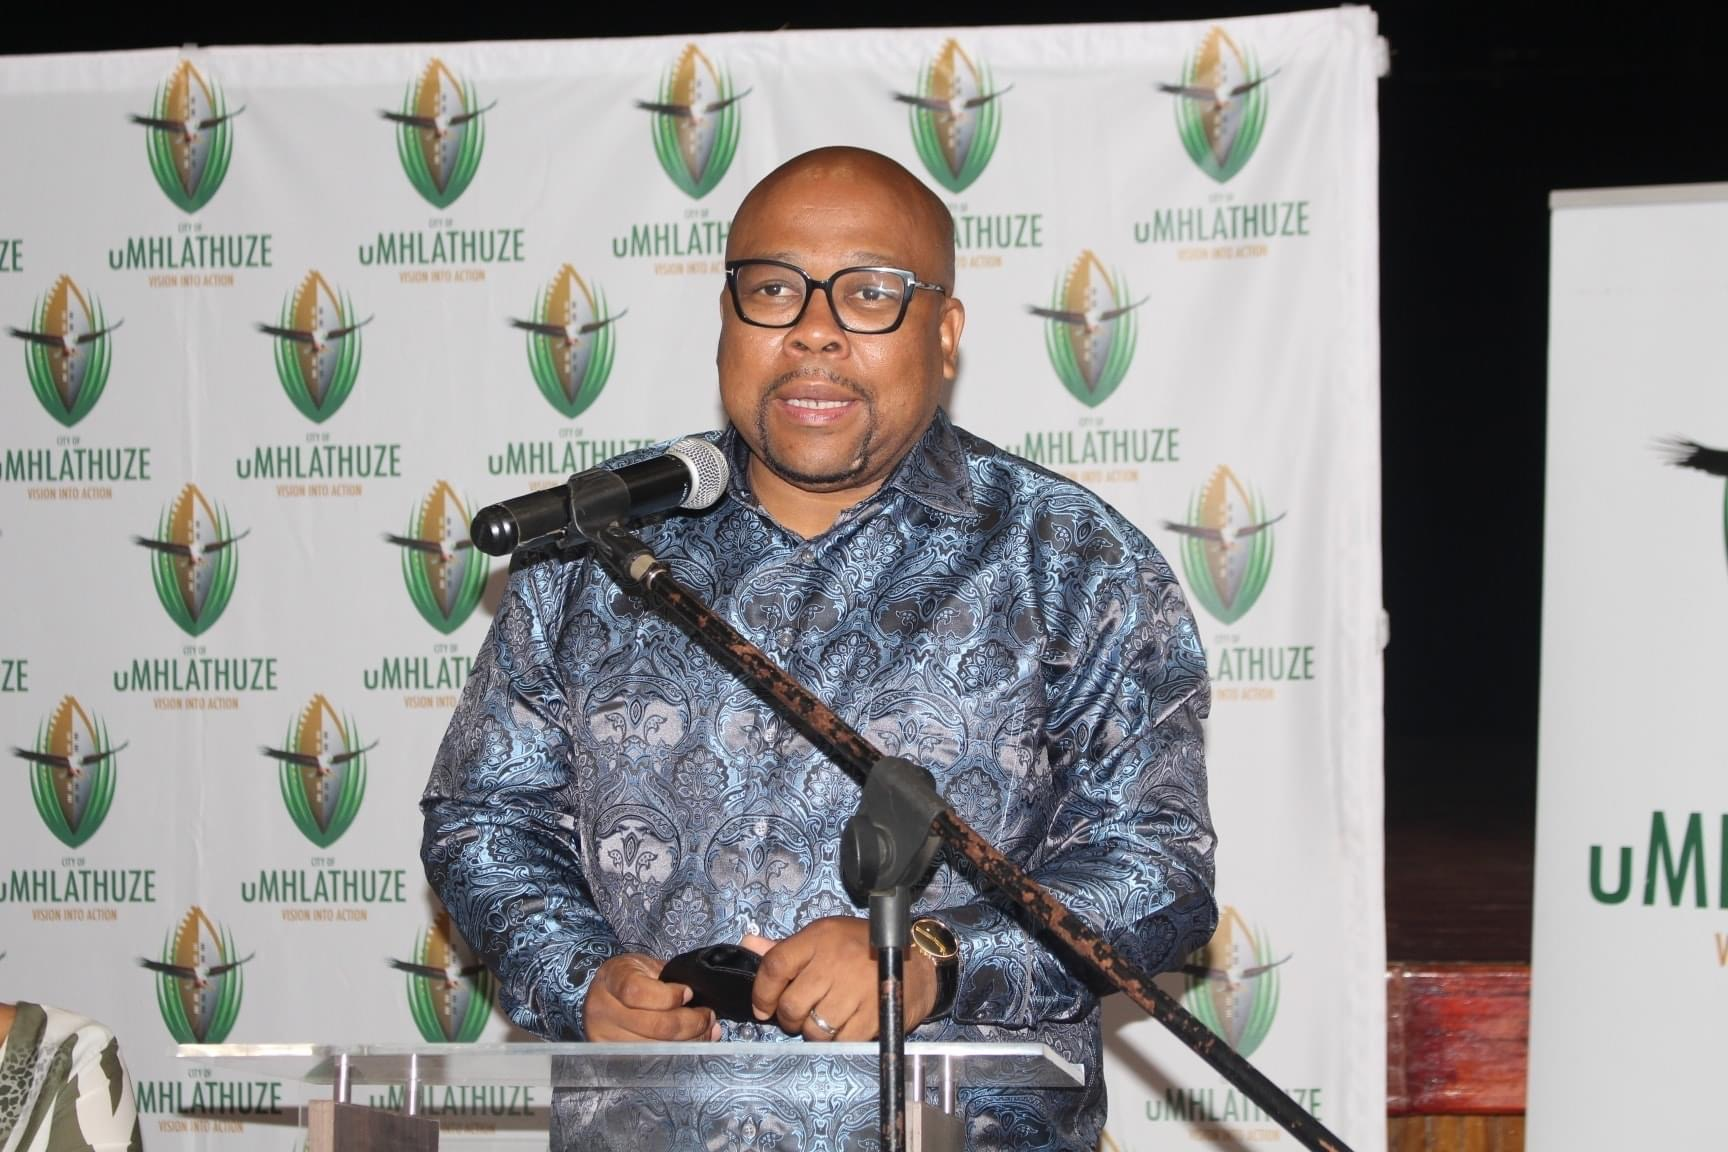 DA calls on the Mayor of uMhlathuze to resign with immediate effect